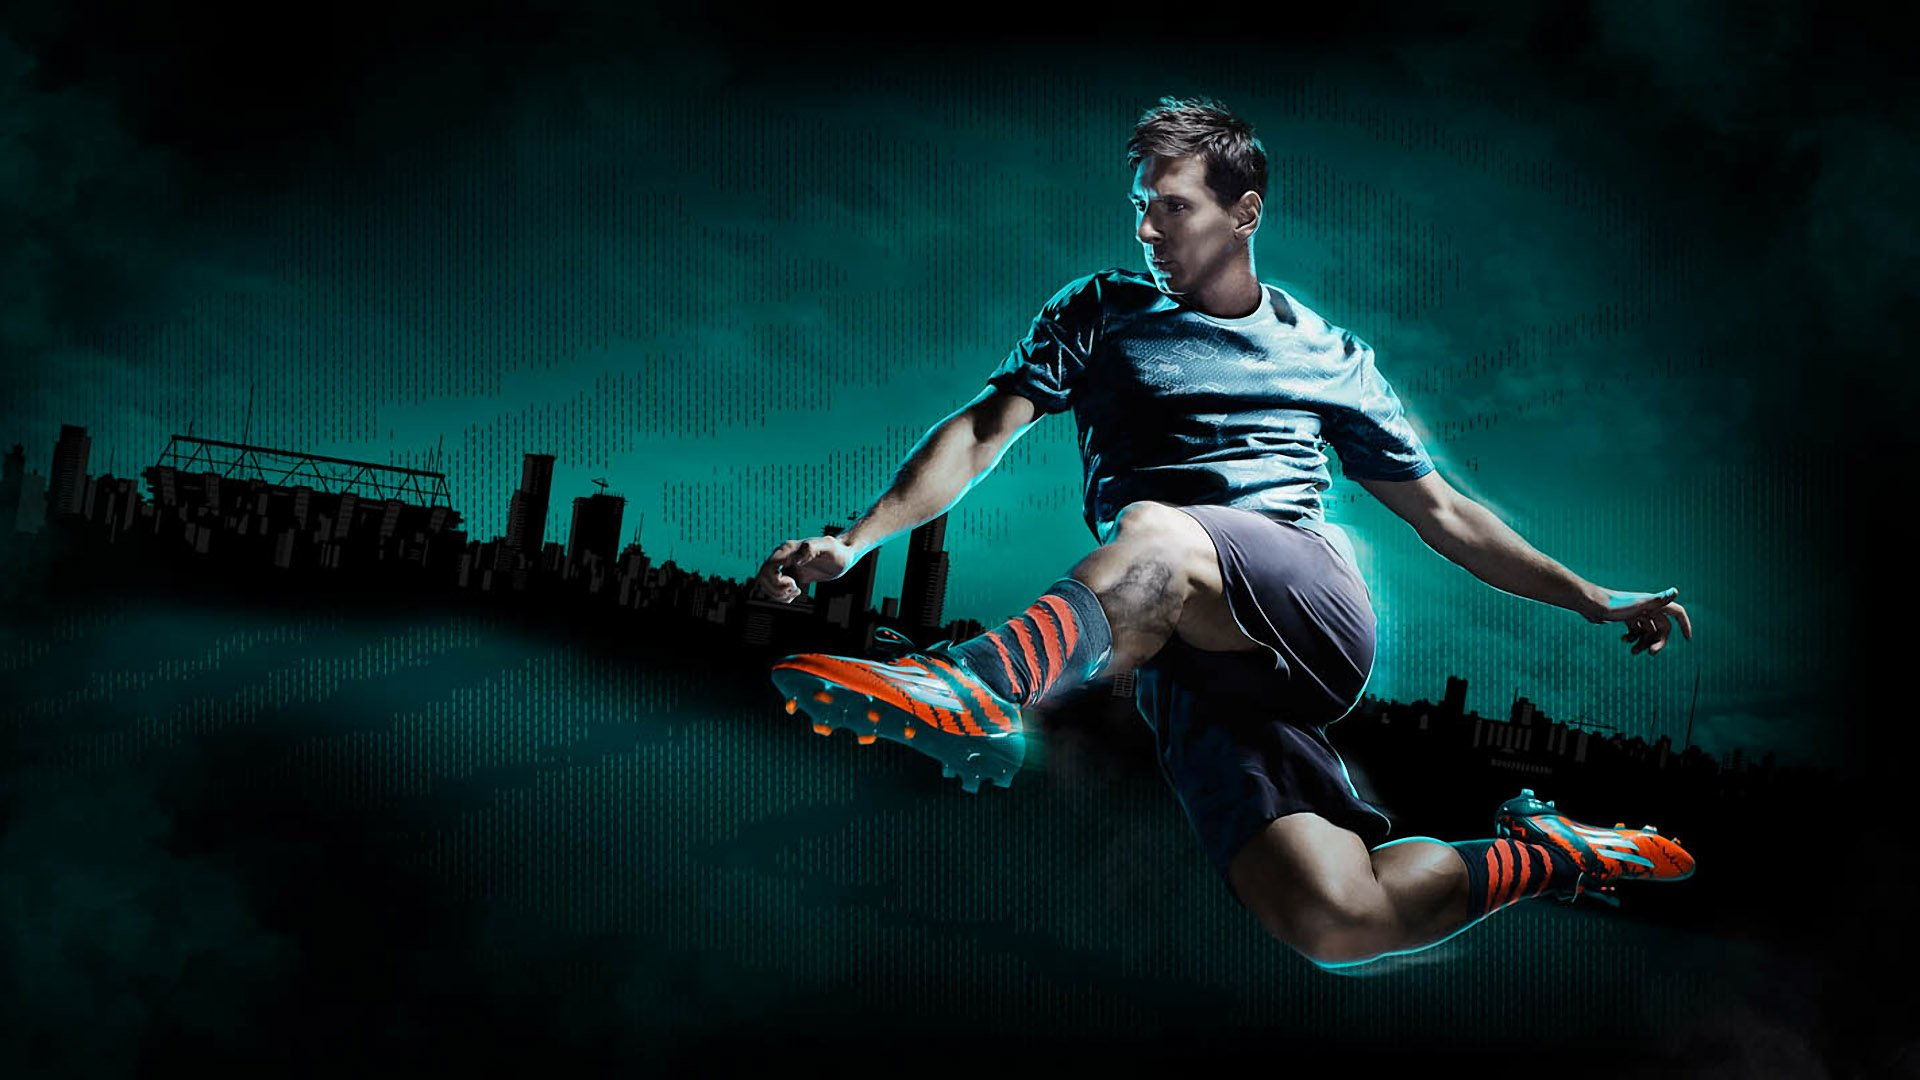 Leo Messi 2015 Adidas Mirosar10 wallpaper 1920x1080 545863 1920x1080